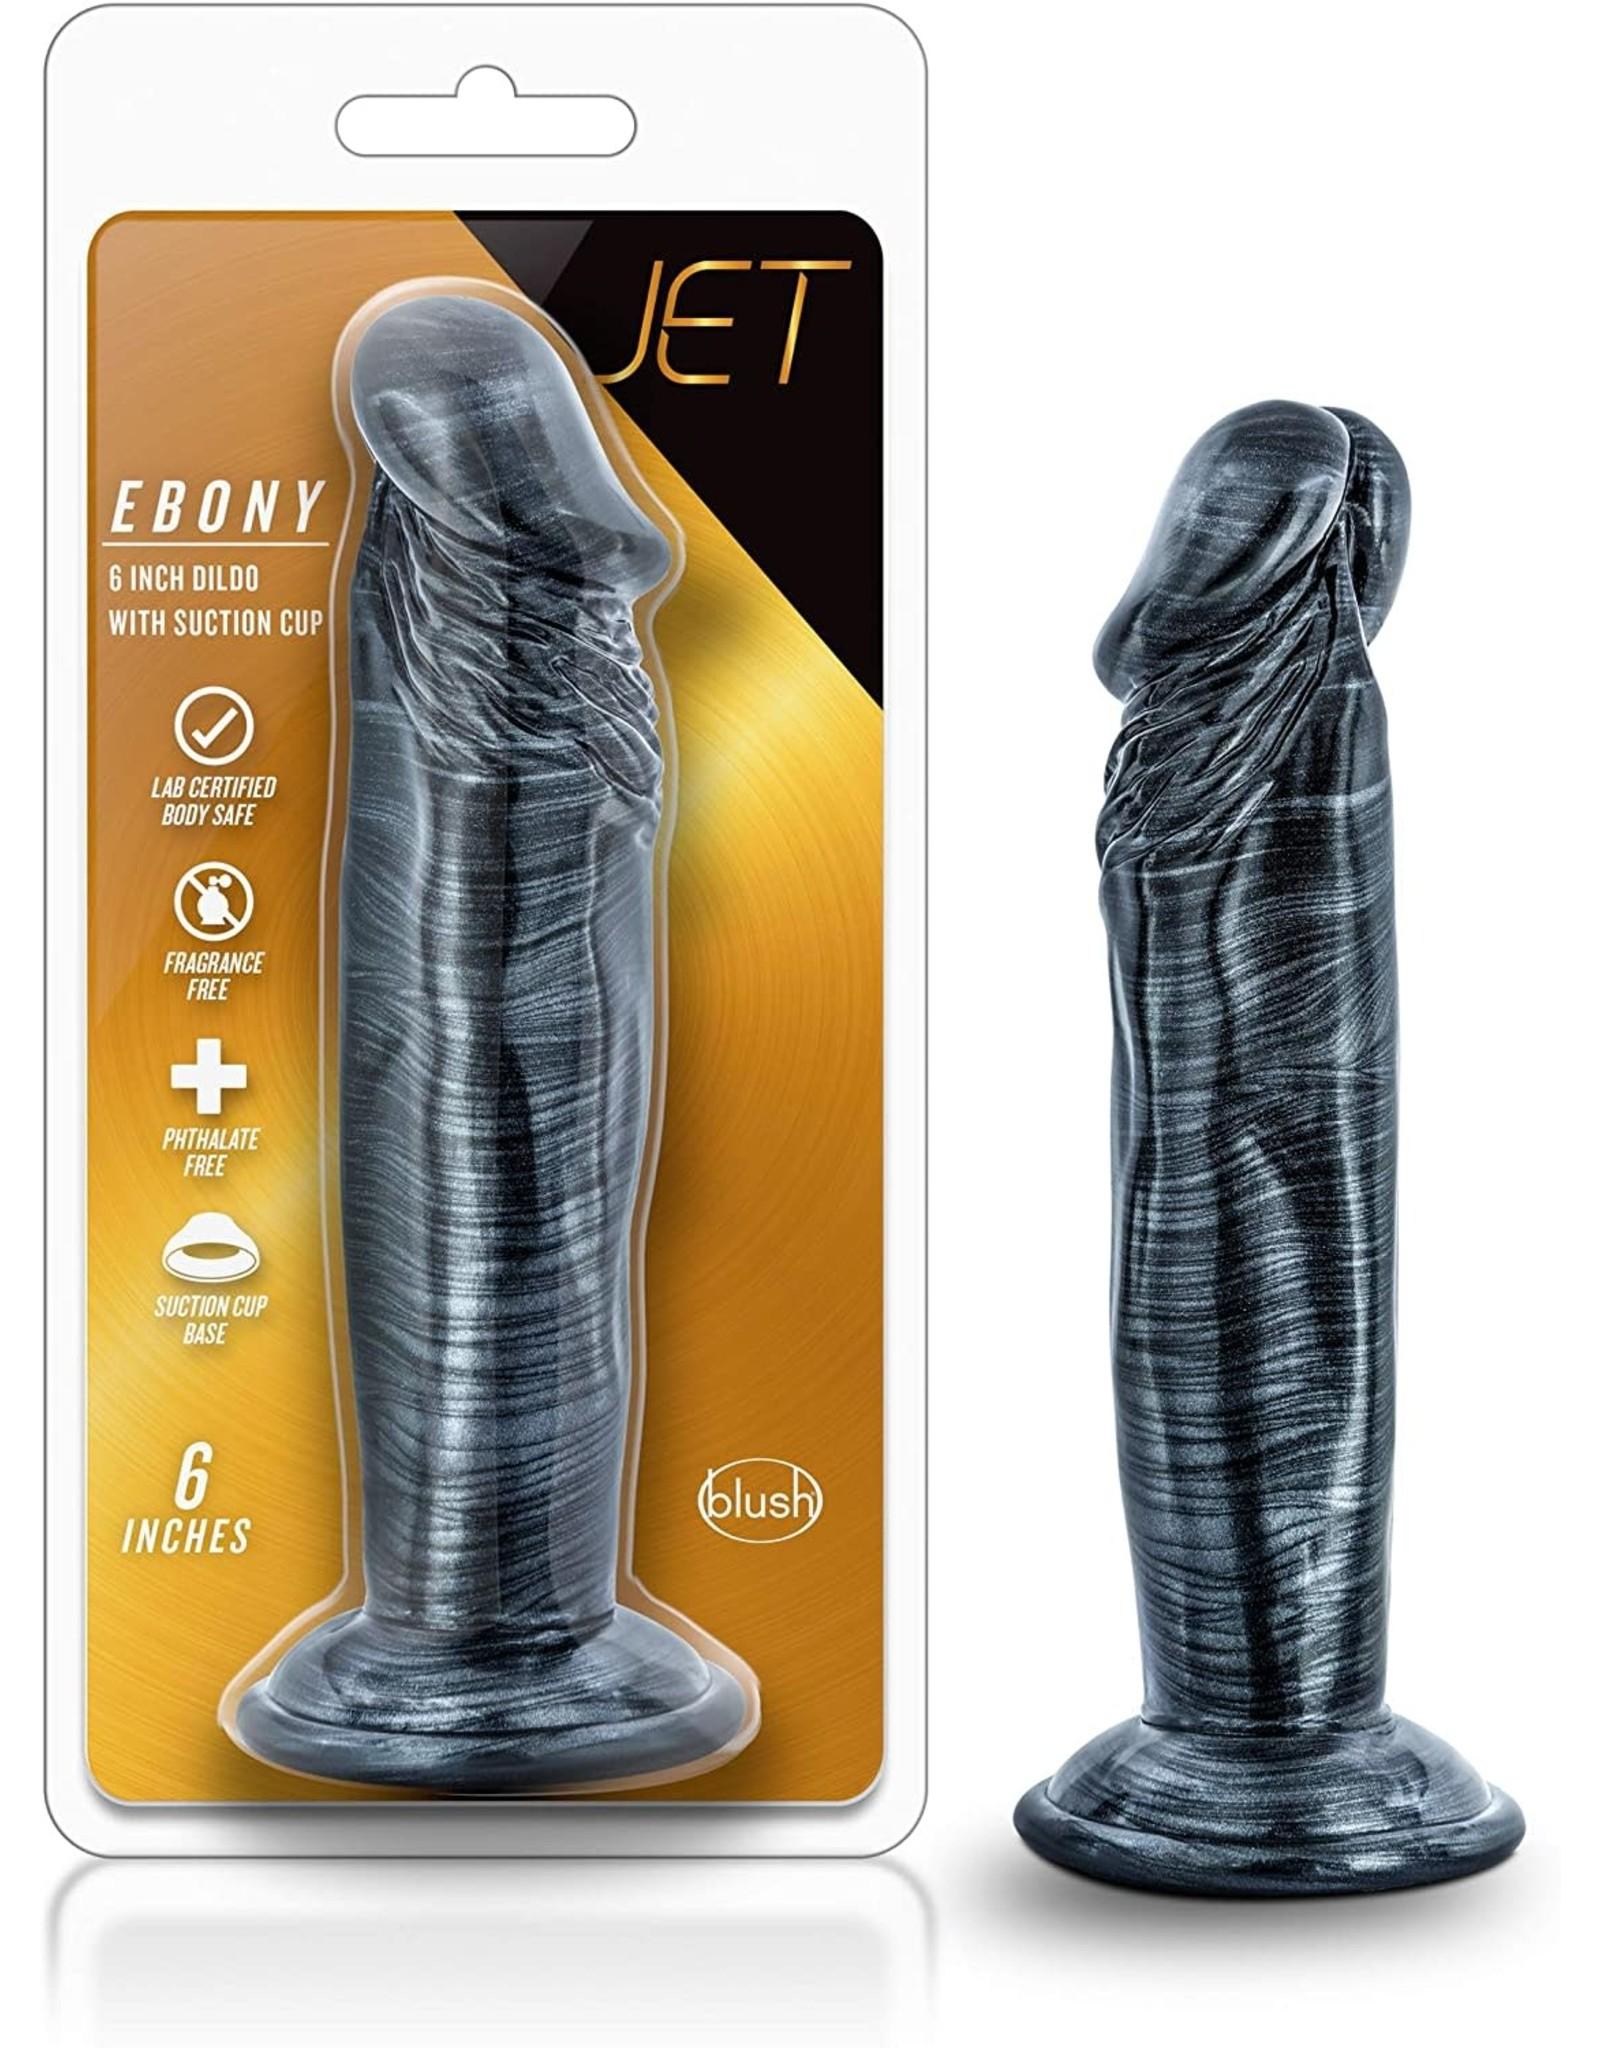 Jet Jet Ebony 6 Inch Dildo Carbon Metallic Black